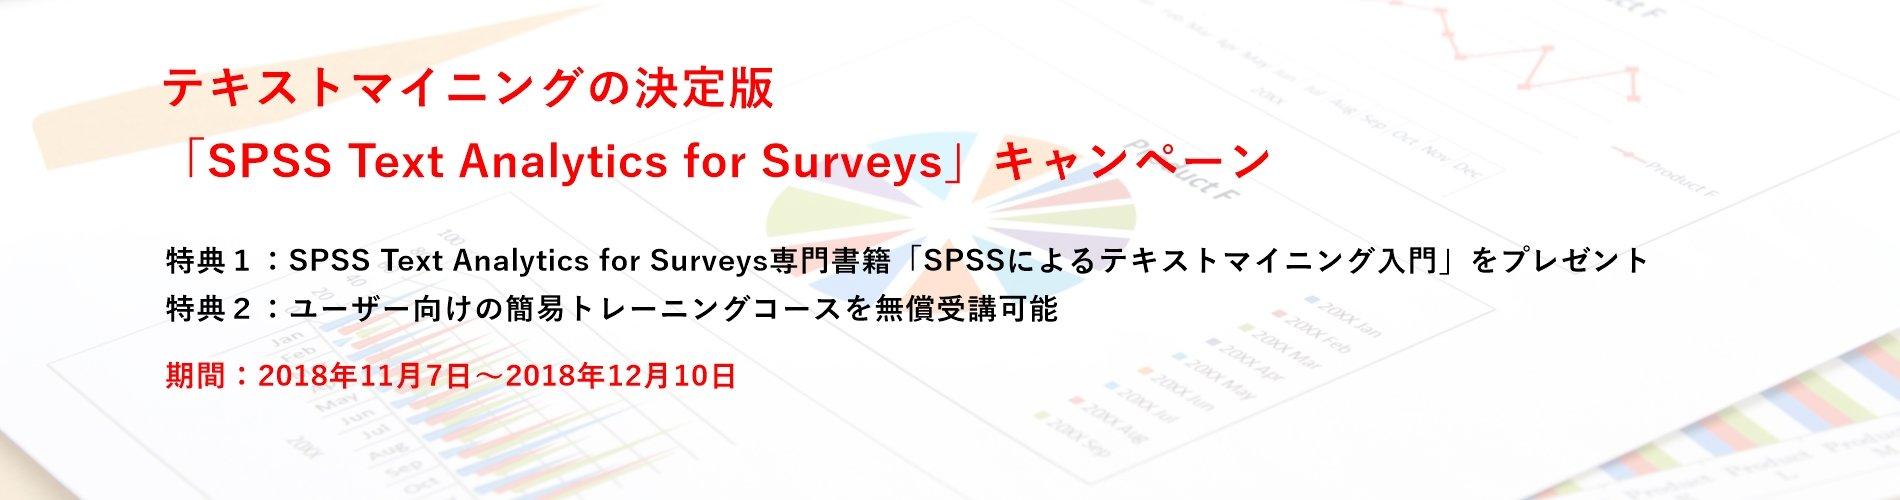 SPSS Text Analytics for Surveys キャンペーン